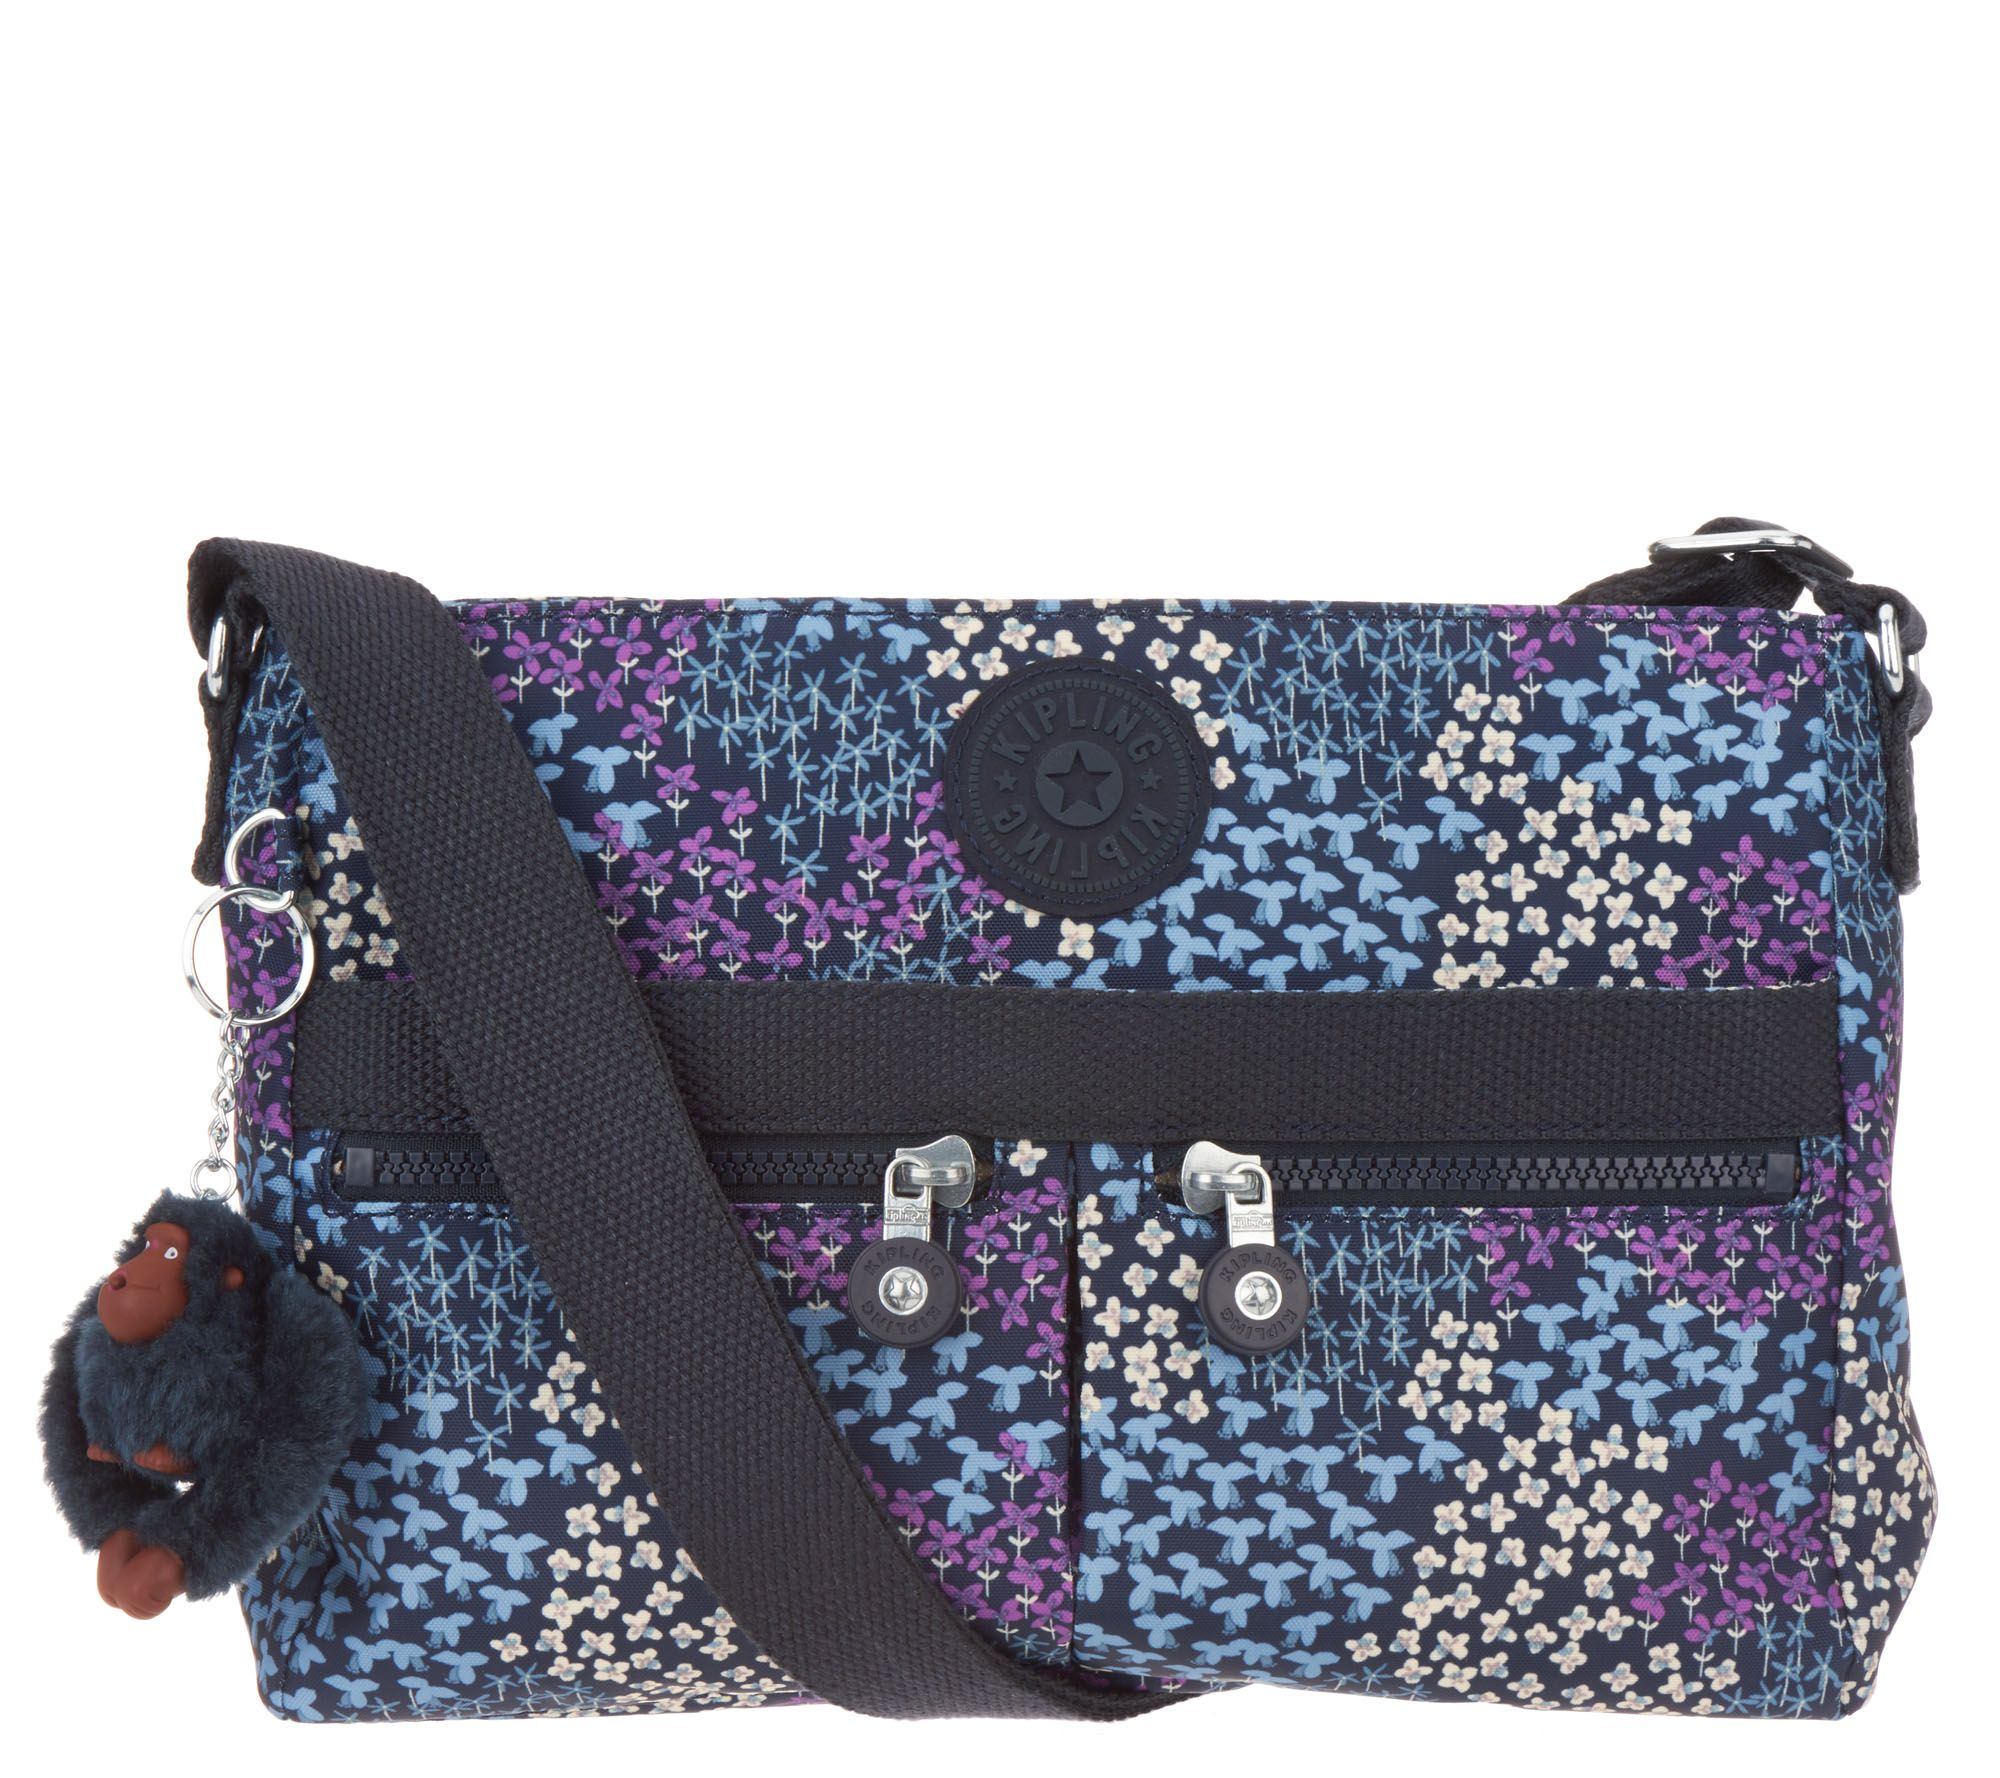 3c54fa5ad Kipling Crossbody Bag - Angie - Page 1 — QVC.com